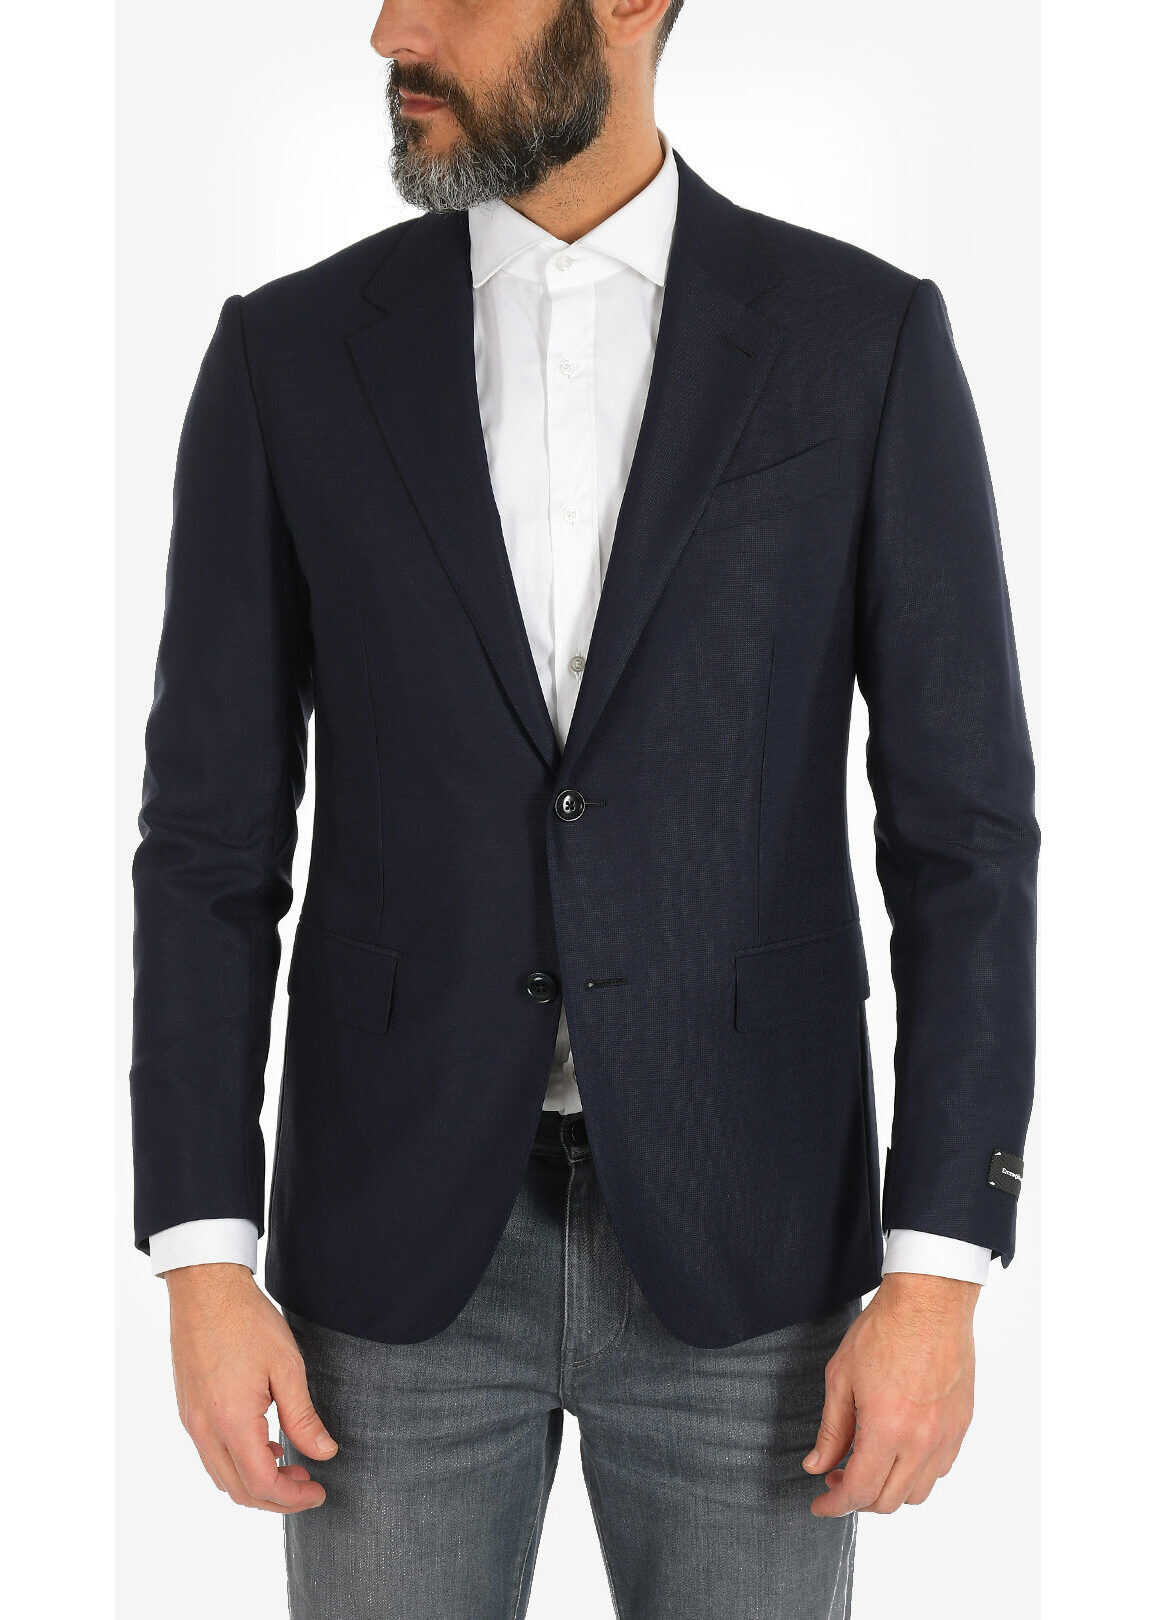 Ermenegildo Zegna EZ TAILORING Two Button Blazer with Flap Pockets BLUE imagine